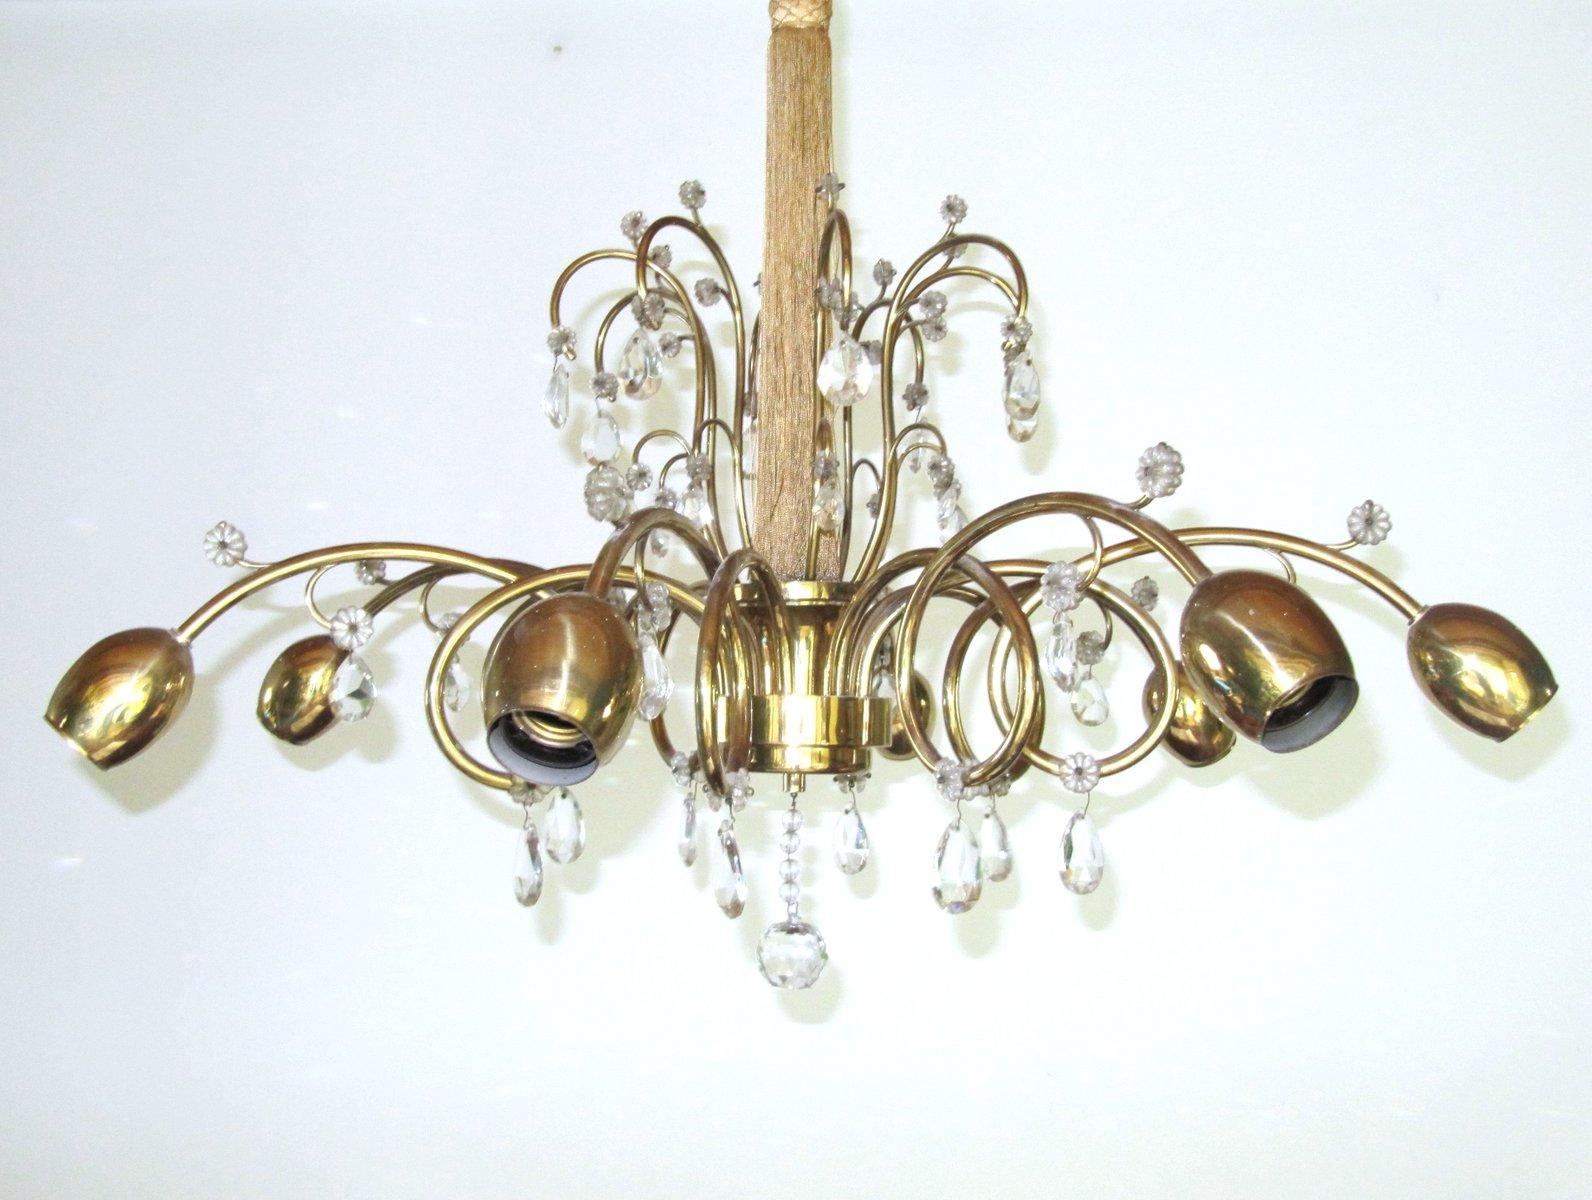 Large austrian art deco chandelier from jl lobmeyr for sale at pamono aloadofball Gallery